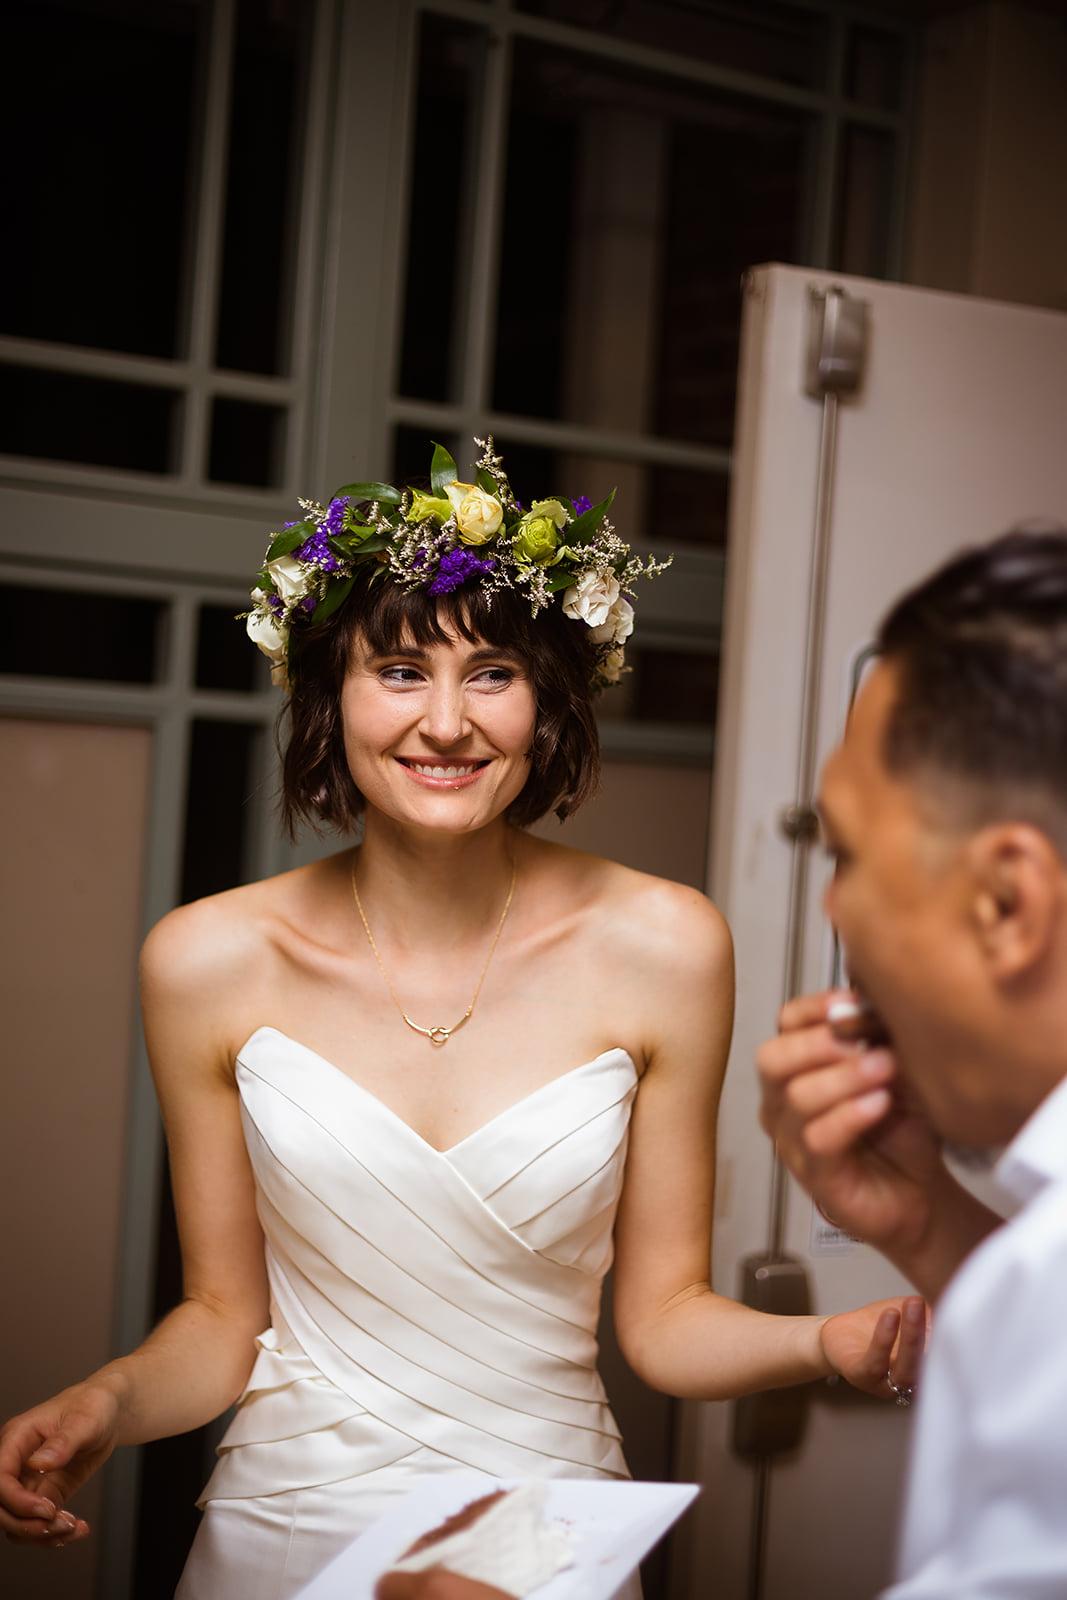 Blacano Wedding - Reception-69.jpg